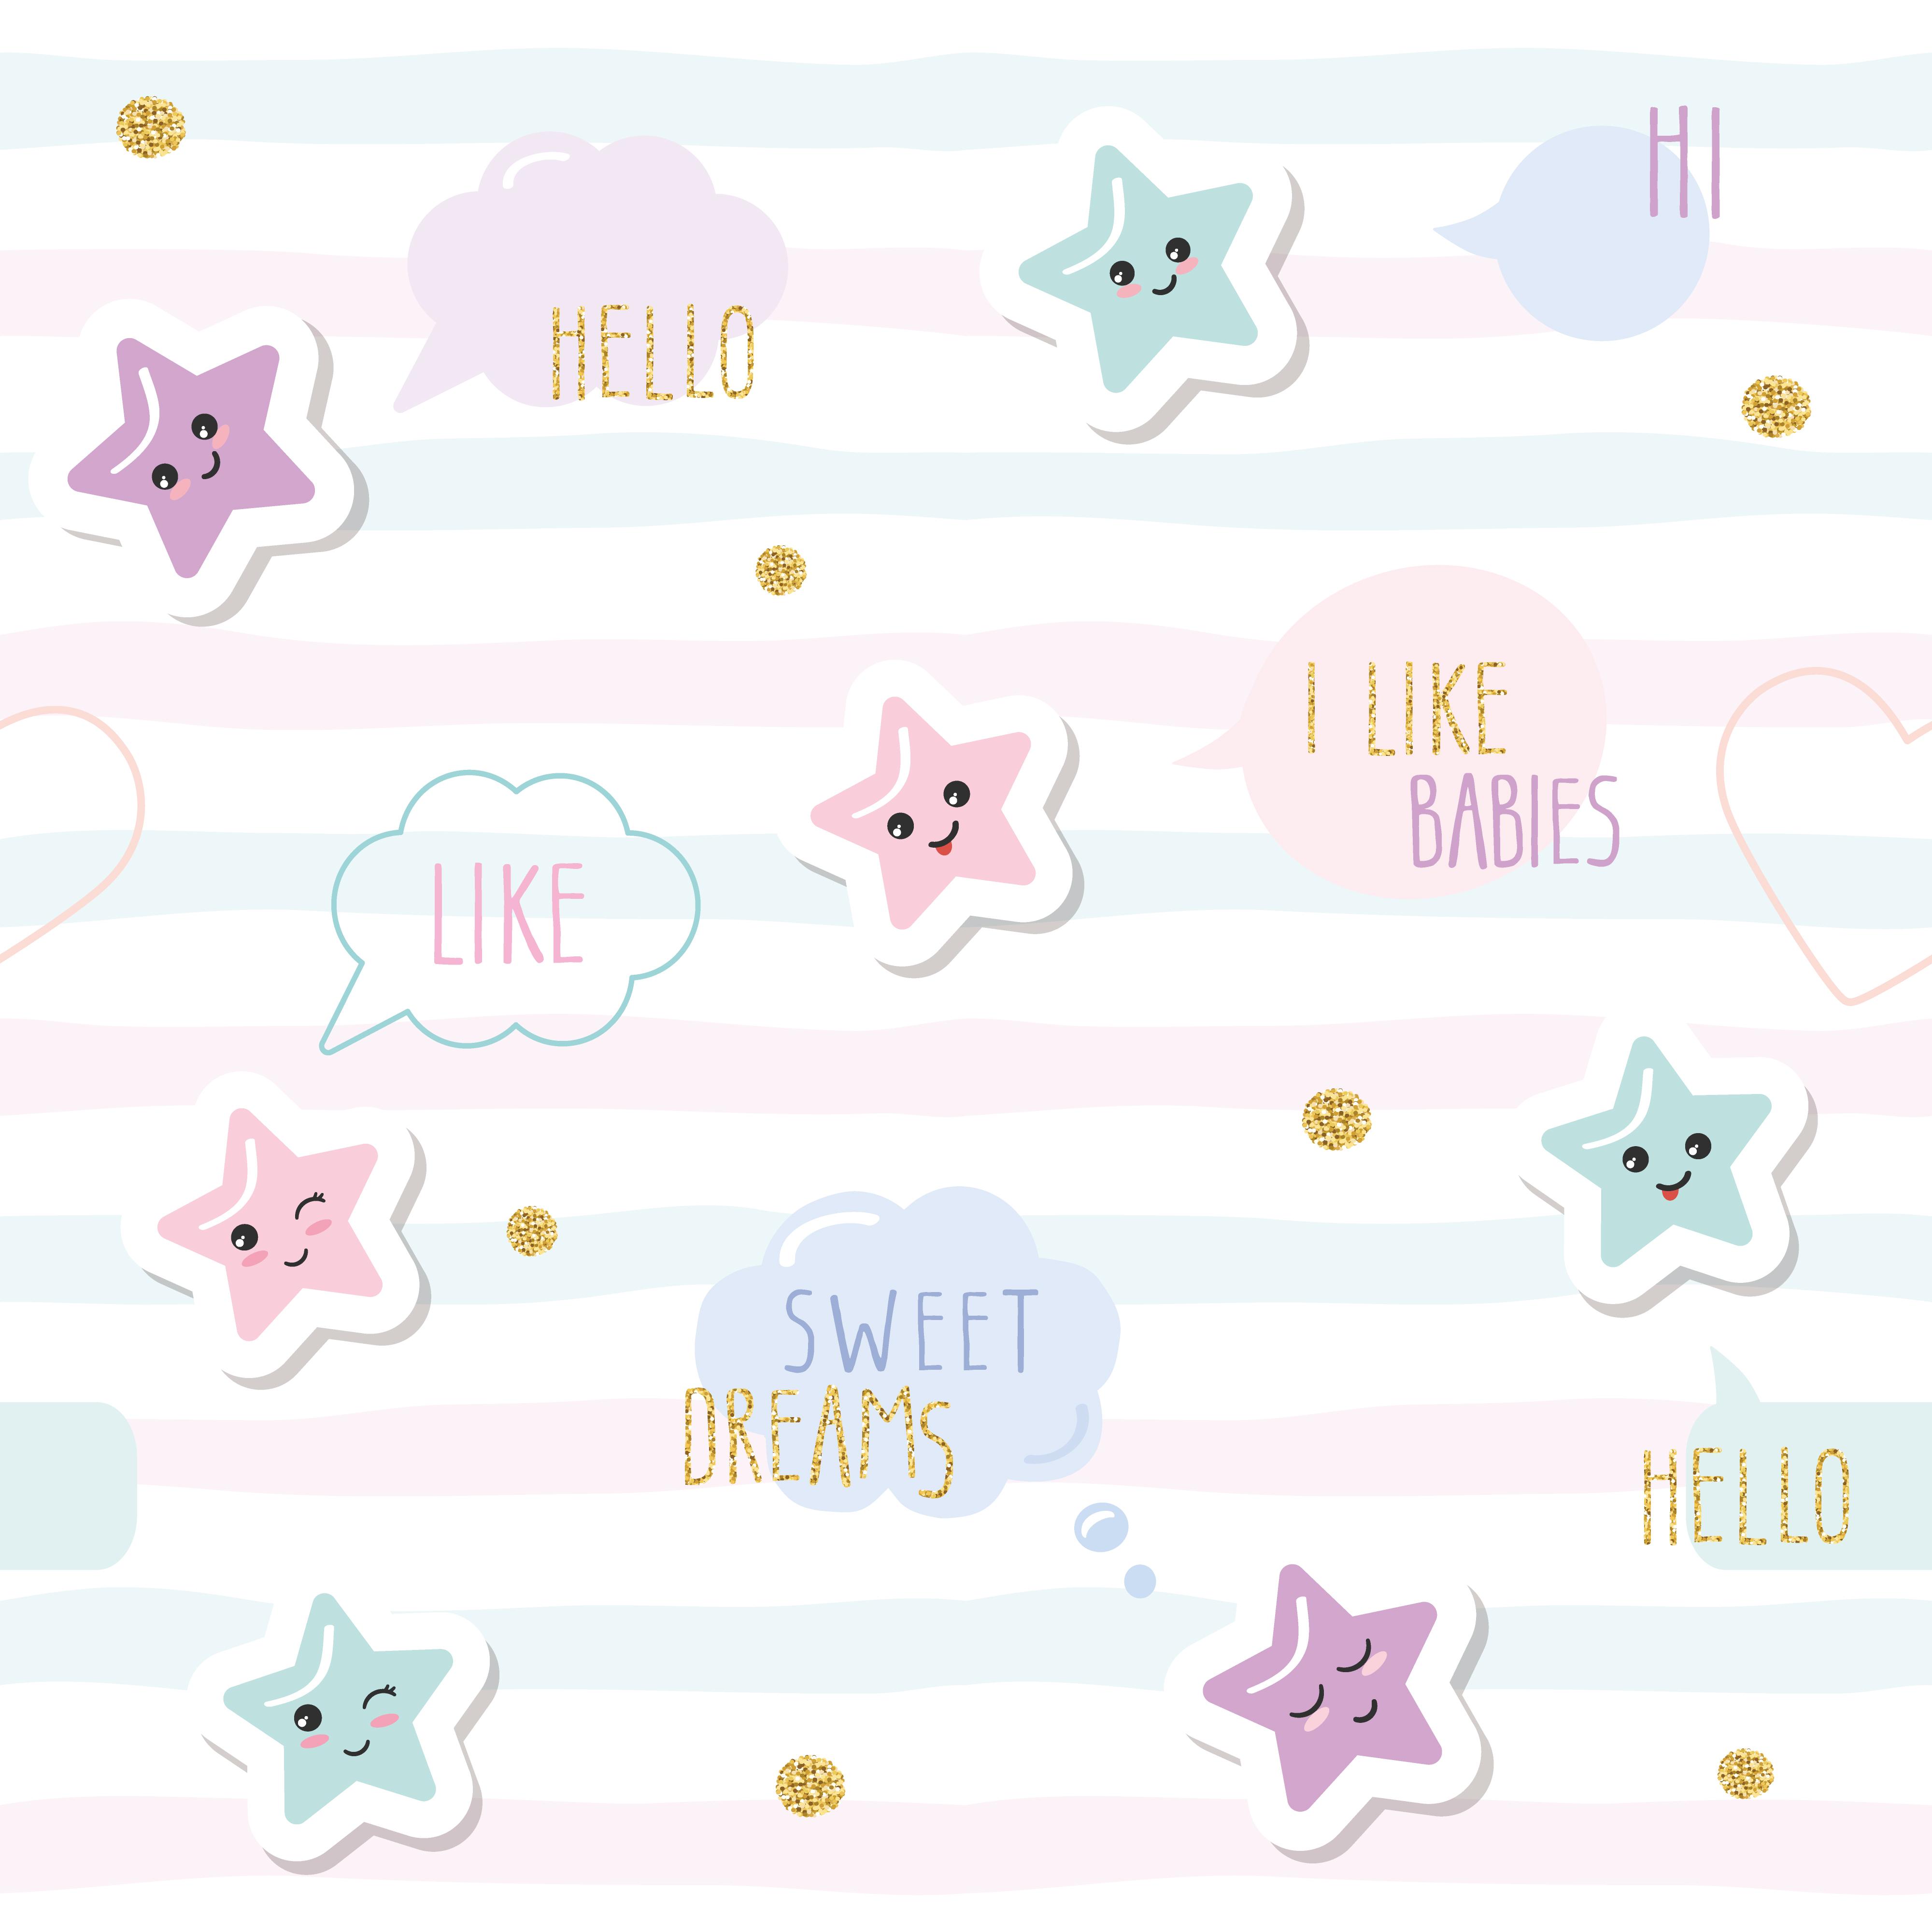 Cute Seamless Pattern Background With Cartoon Kawaii Stars